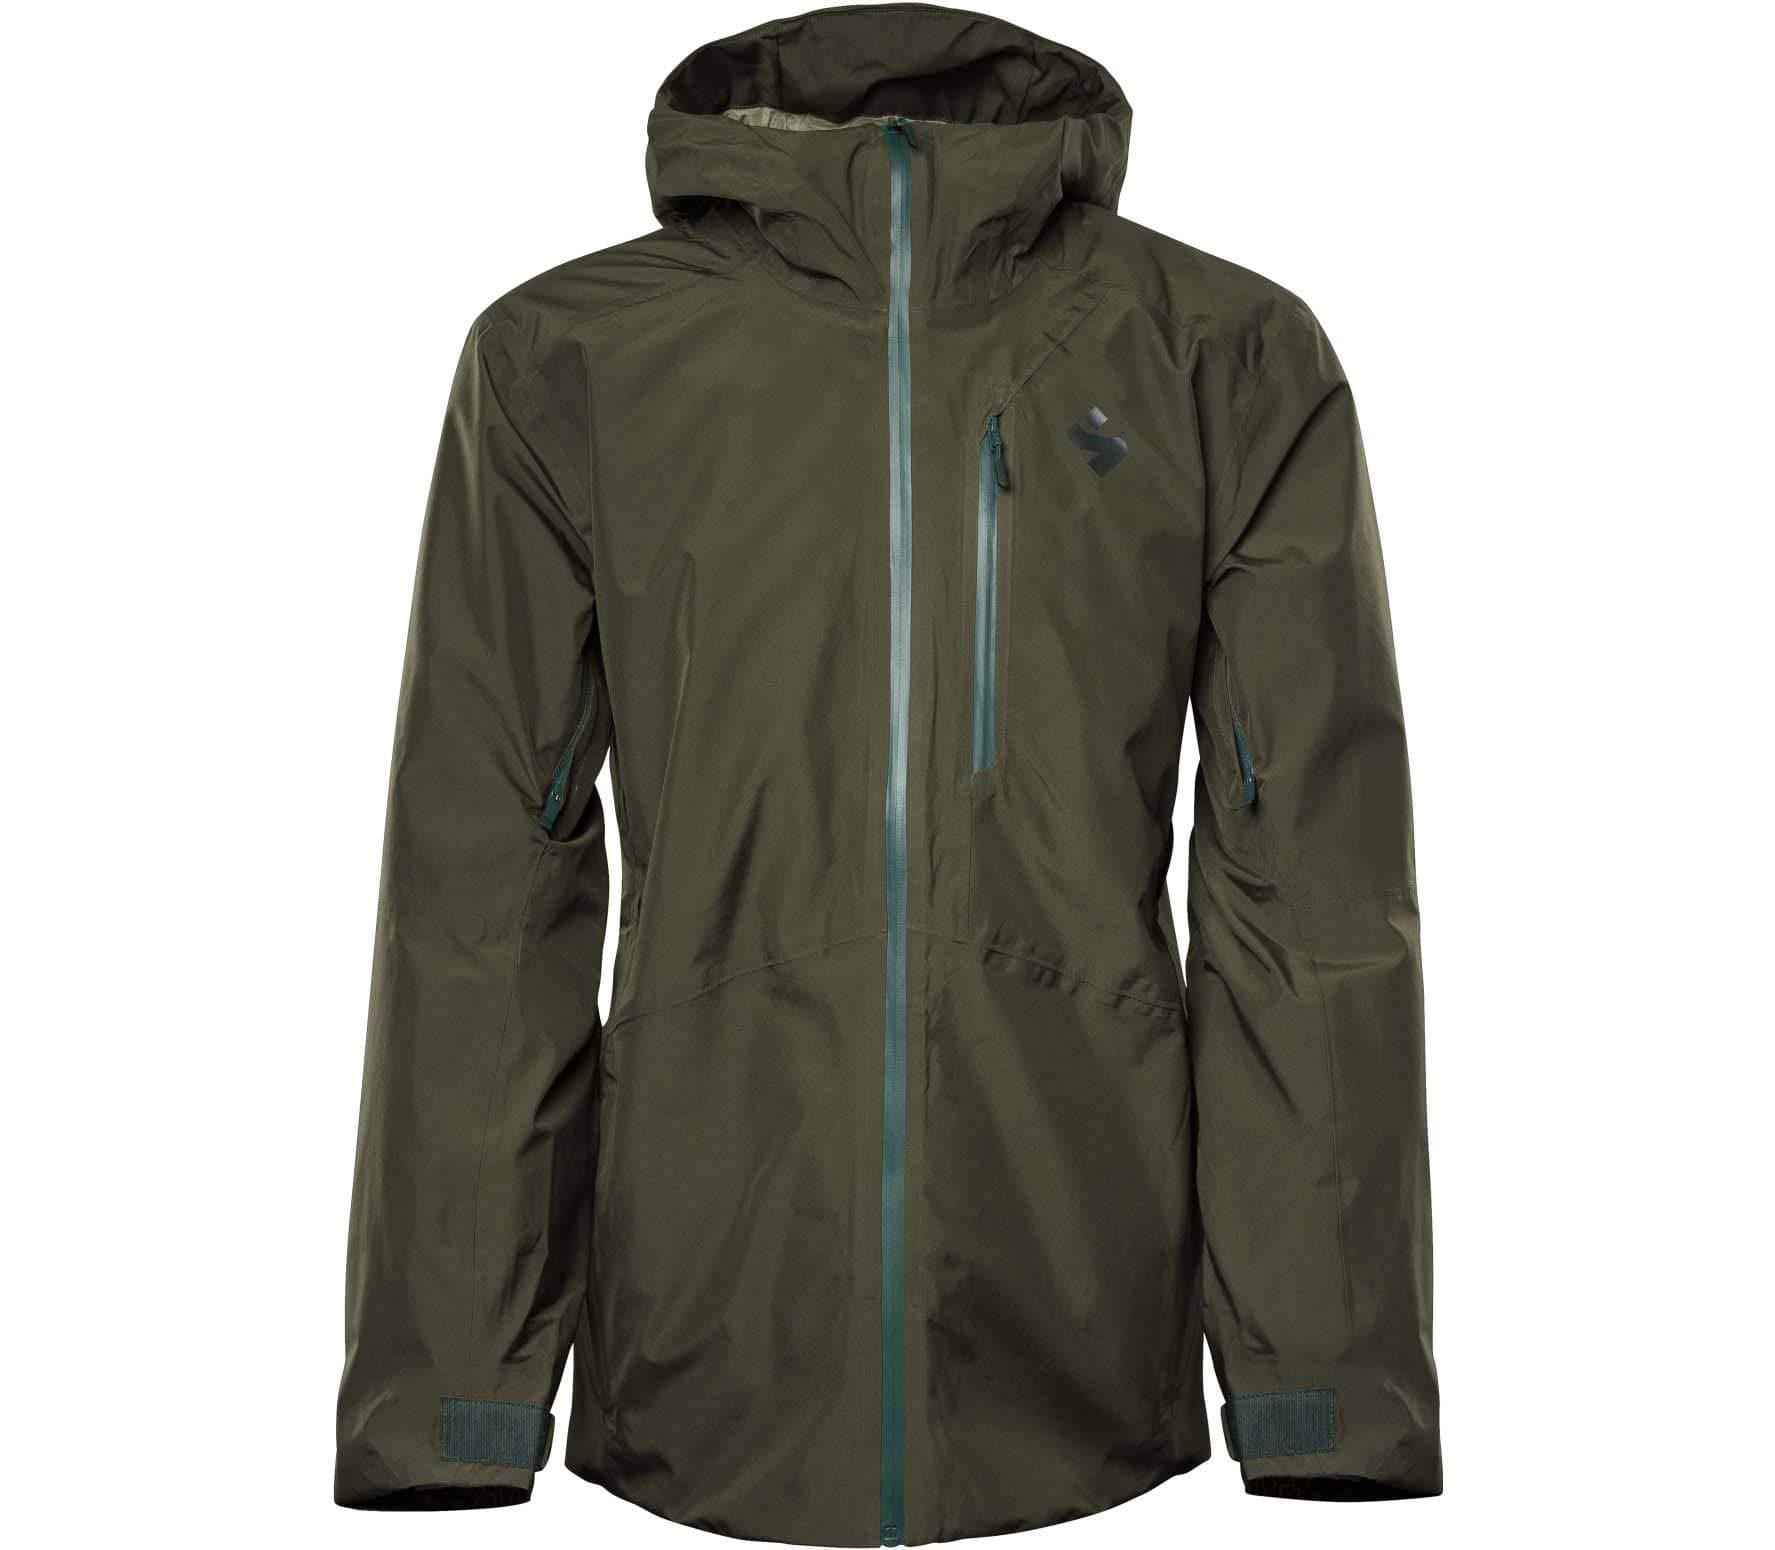 Sweet Protection Herren Jacket Crusader GTX Infinium JKT Pine Green, M, 820090